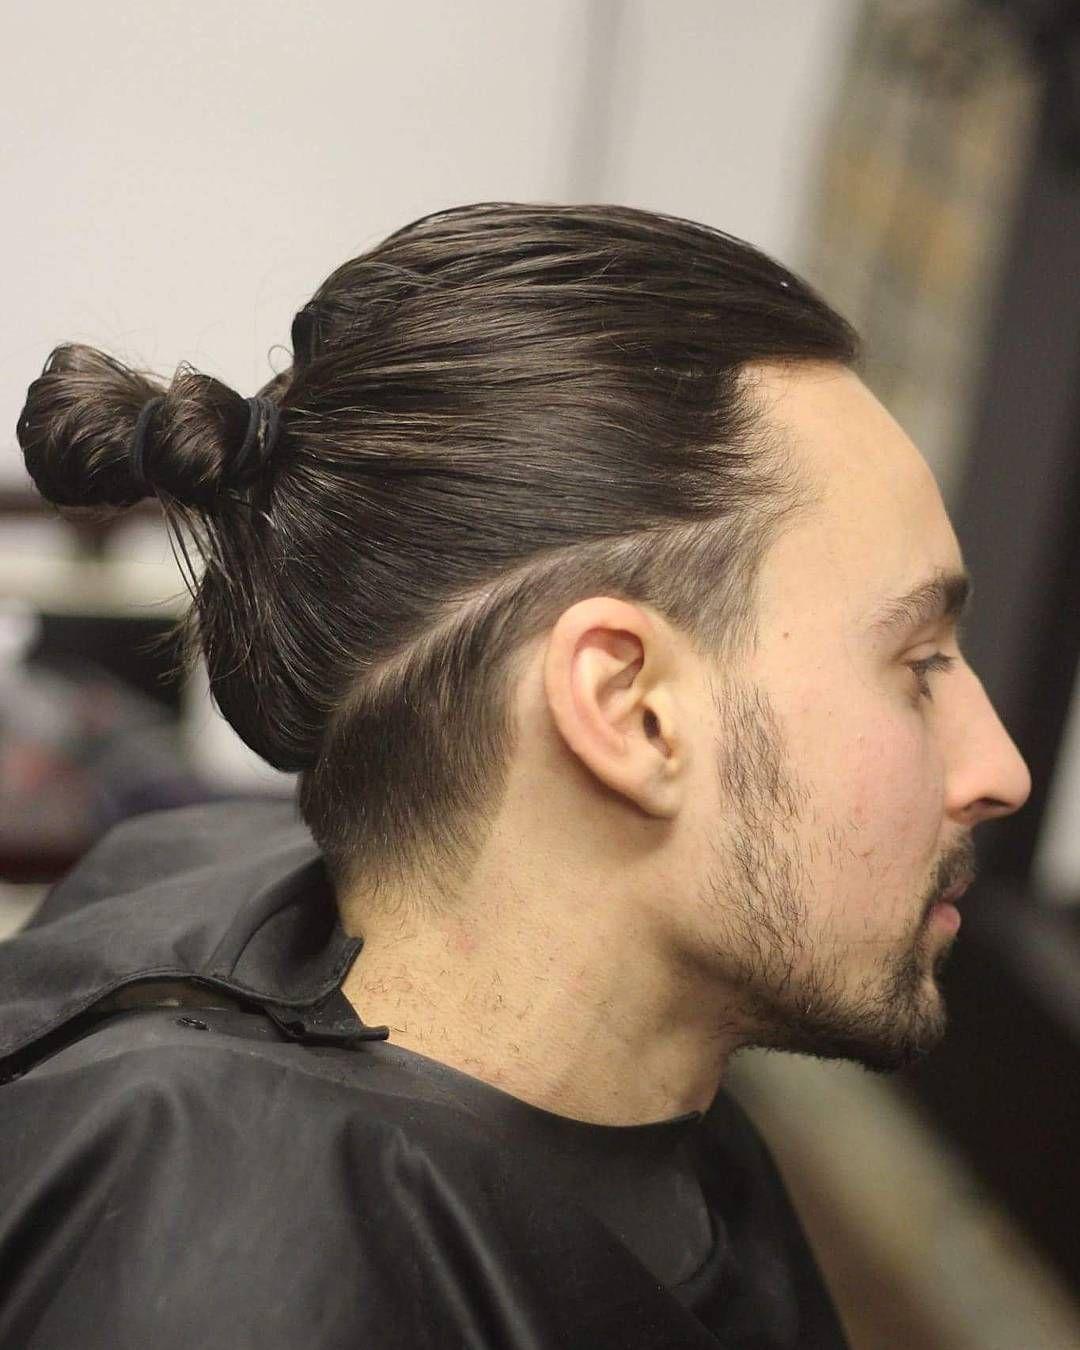 22 Long Hair Ideas For Men Cool Long Haircuts Hairstyles For 2020 Undercut Long Hair Guy Haircuts Long Mens Hairstyles Undercut